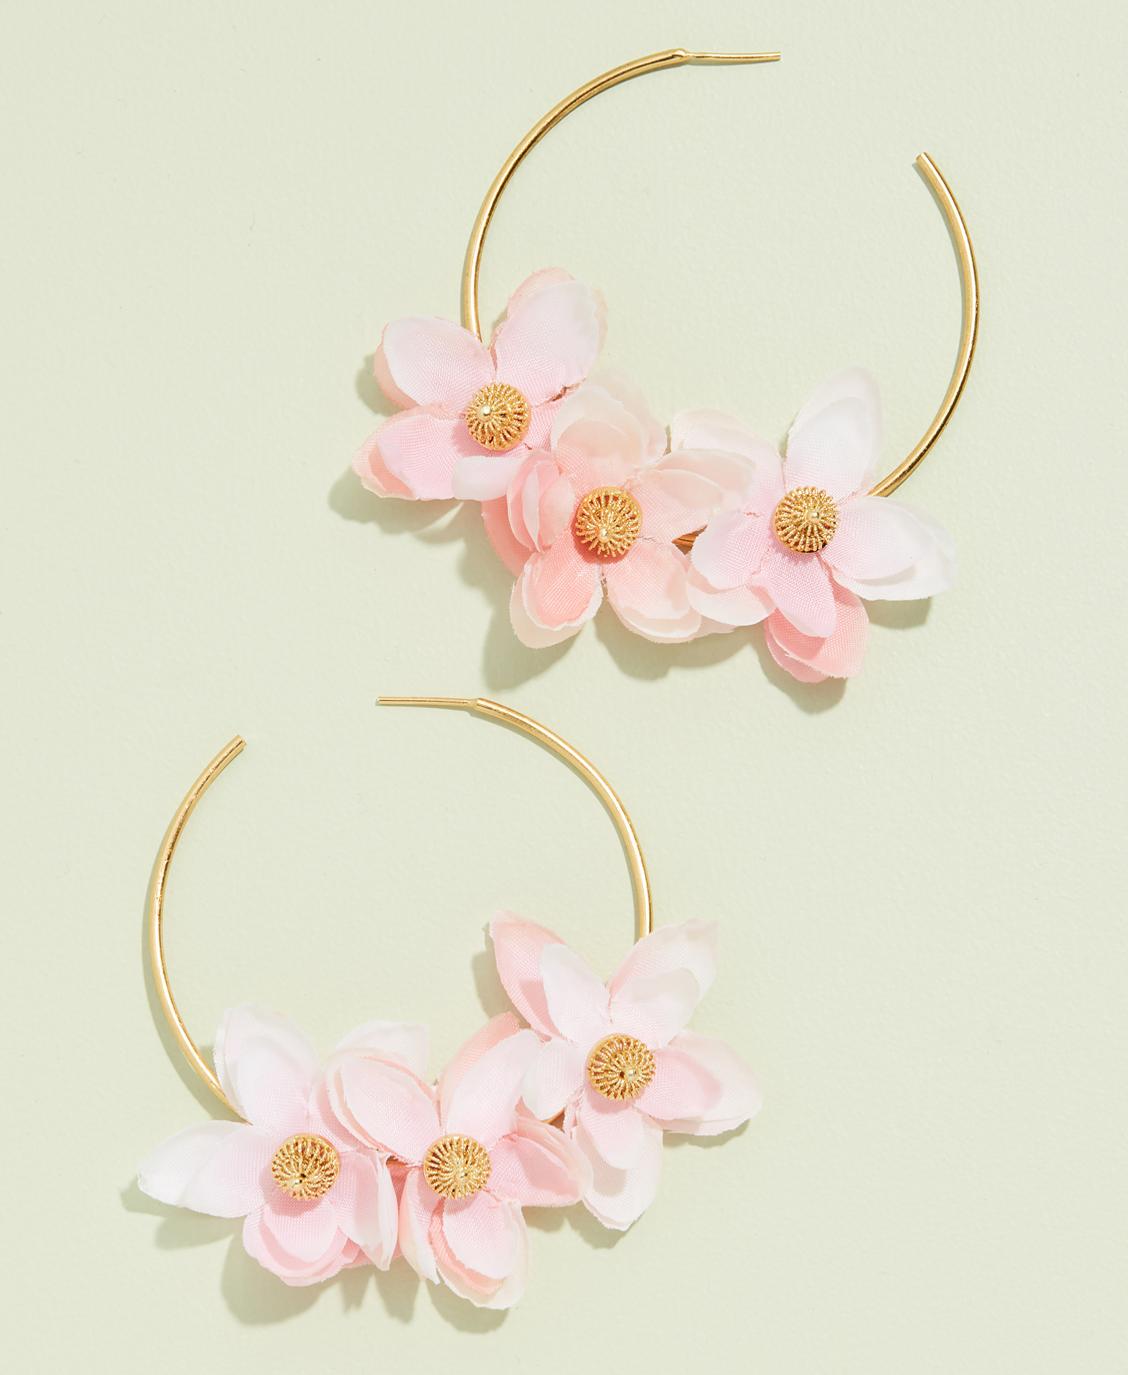 Mallarino Gabby Hoop Earrings - Shopbop